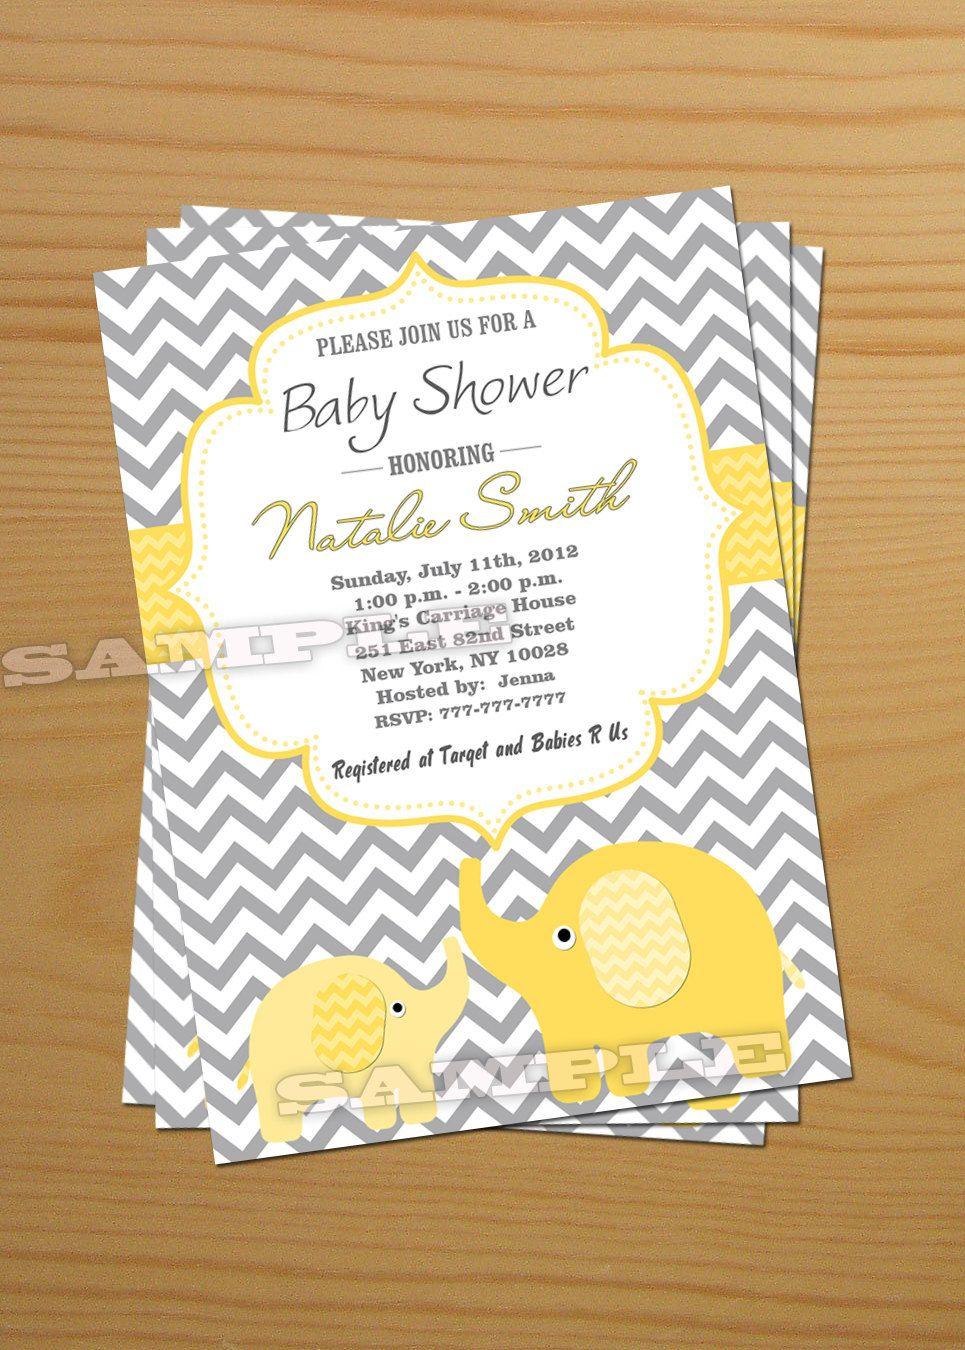 Elephant Baby Shower Invitation Gender Neutral Baby Shower - Free Printable Elephant Baby Shower Invitations